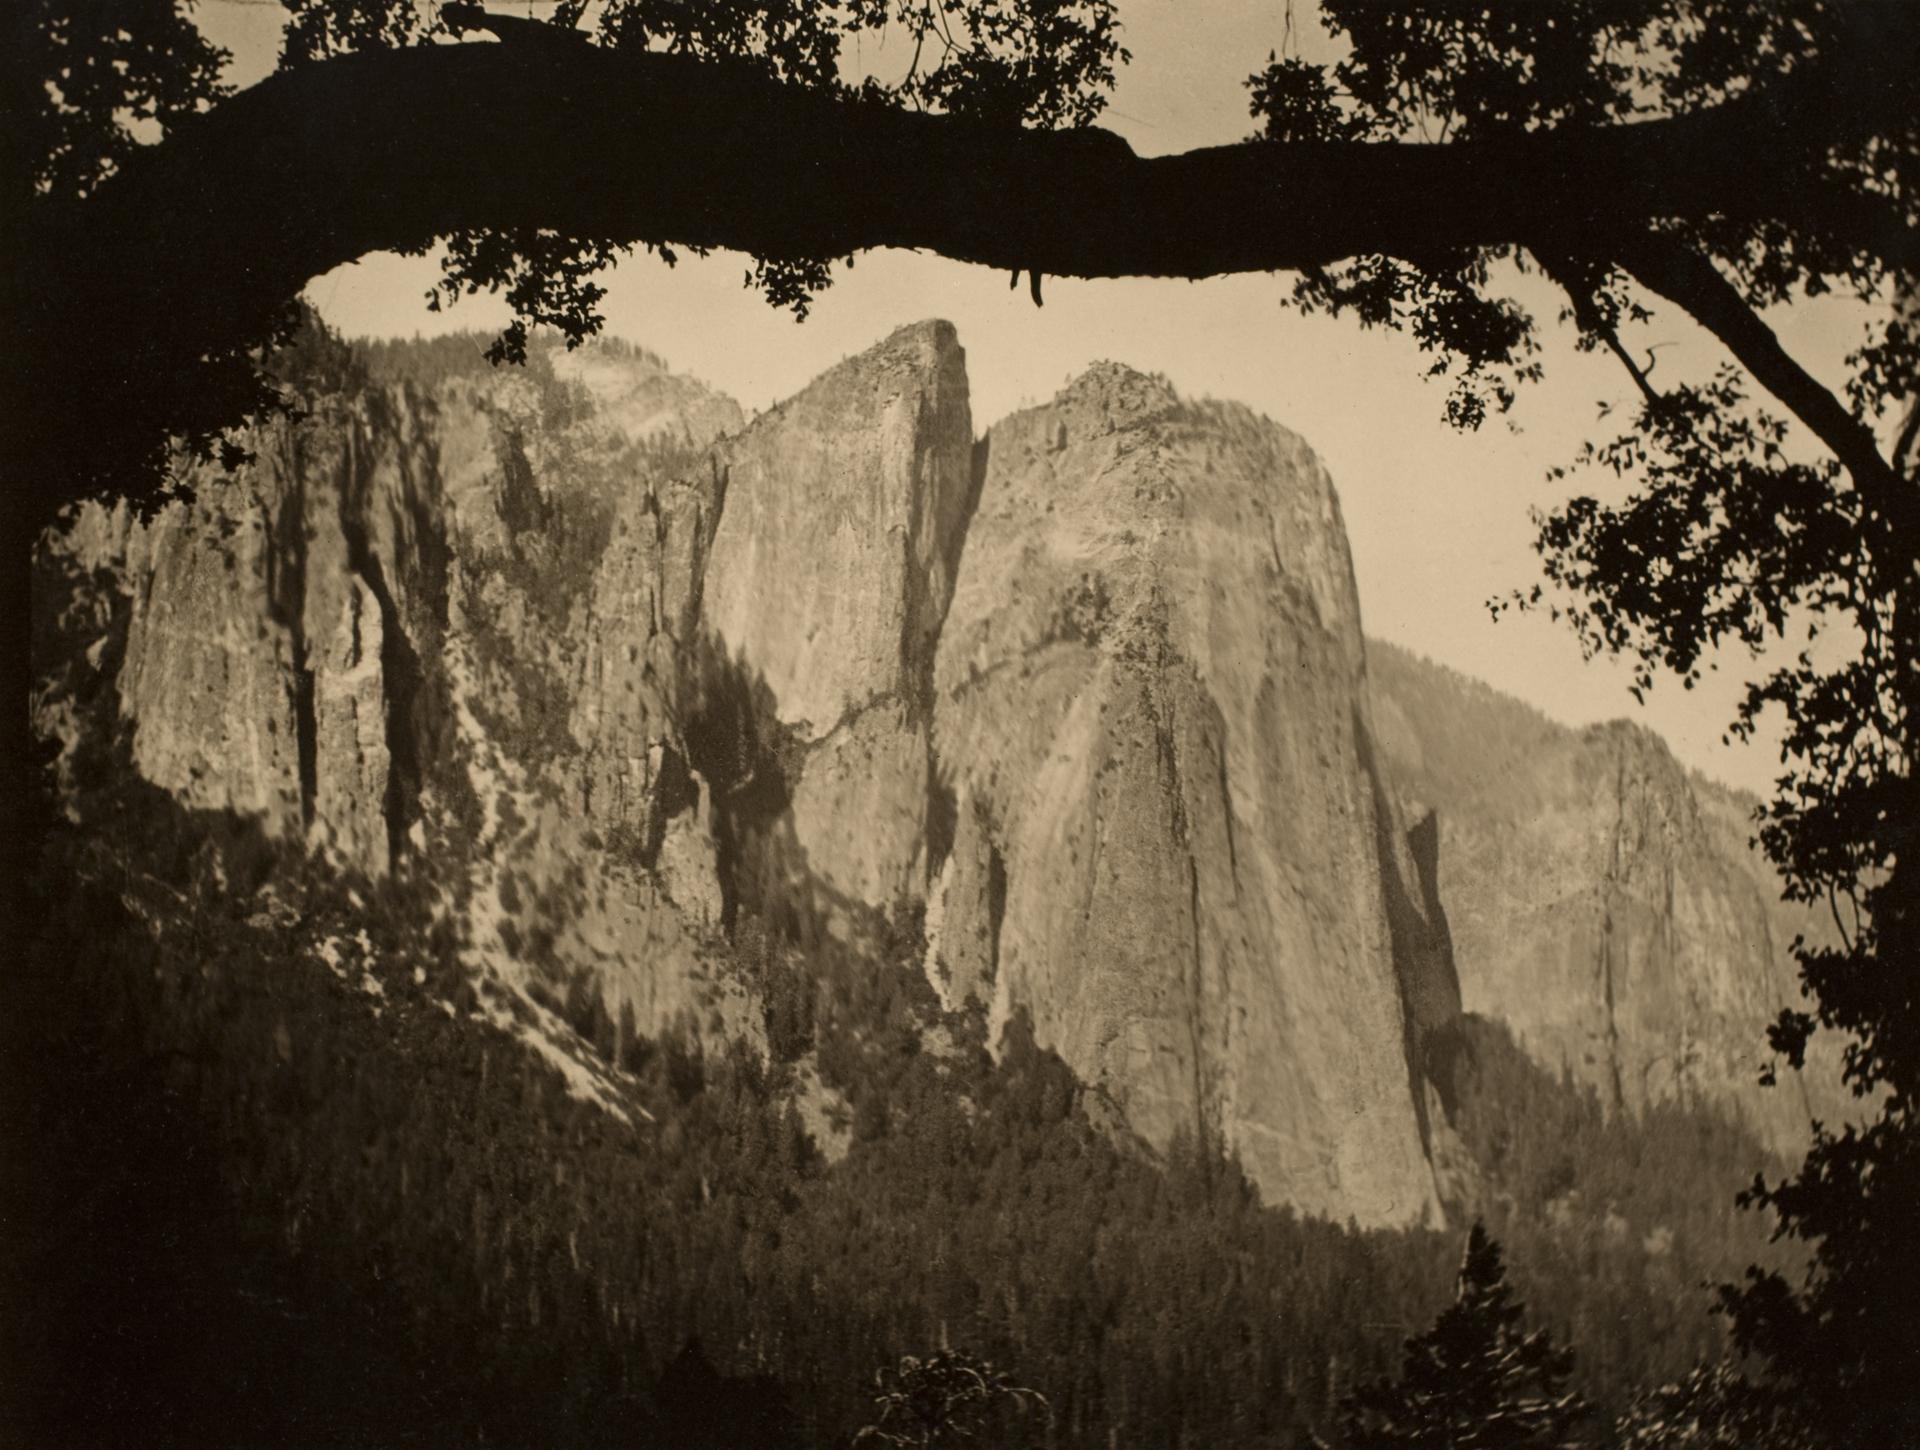 The Three Brothers, Yosemite, 1911, 1911